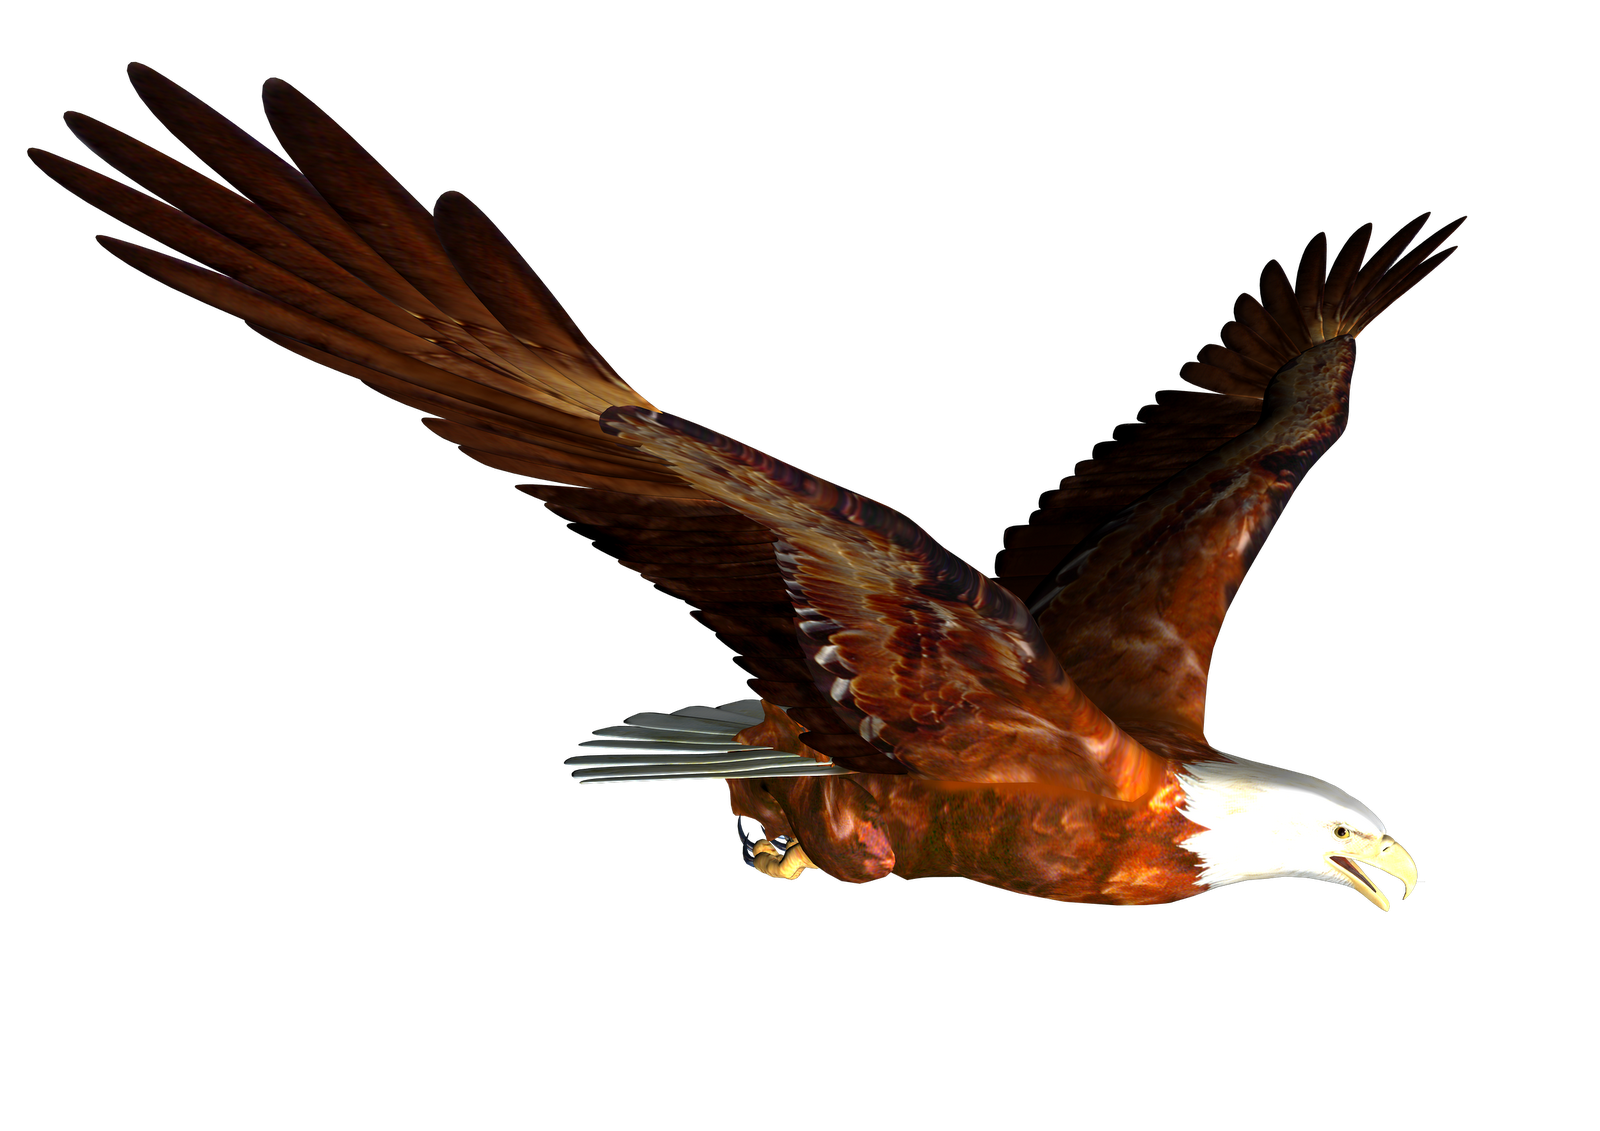 1600x1131 Clipart Eagle Clipart Image